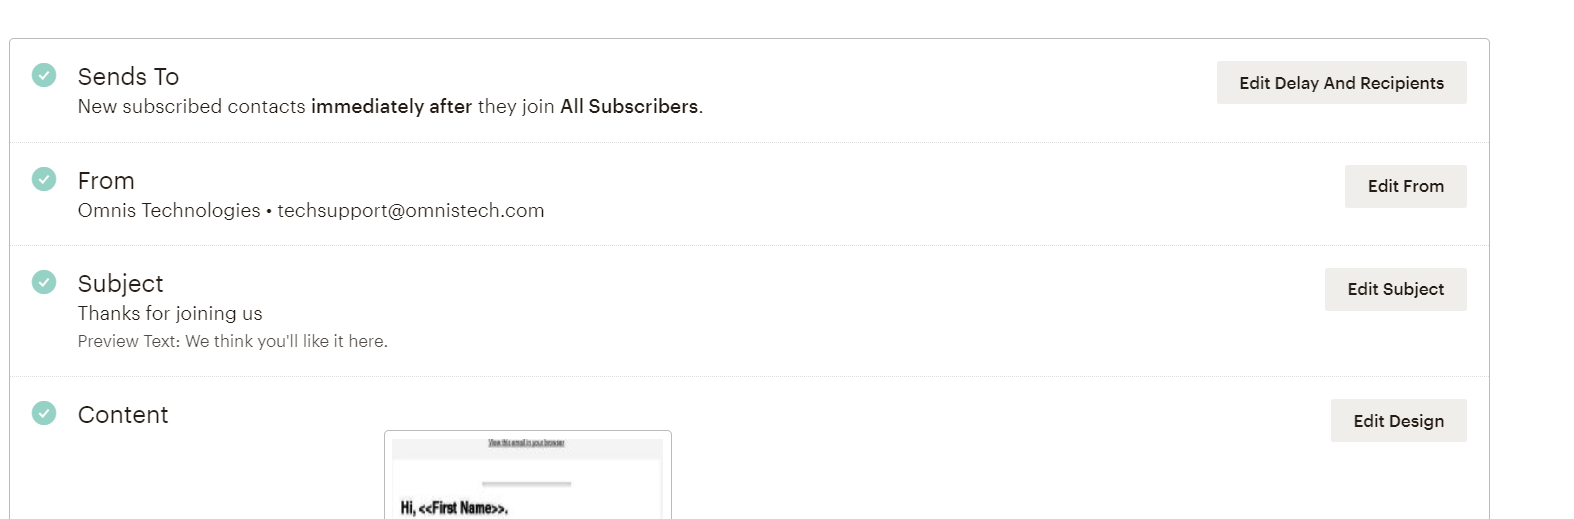 MailChimp email details